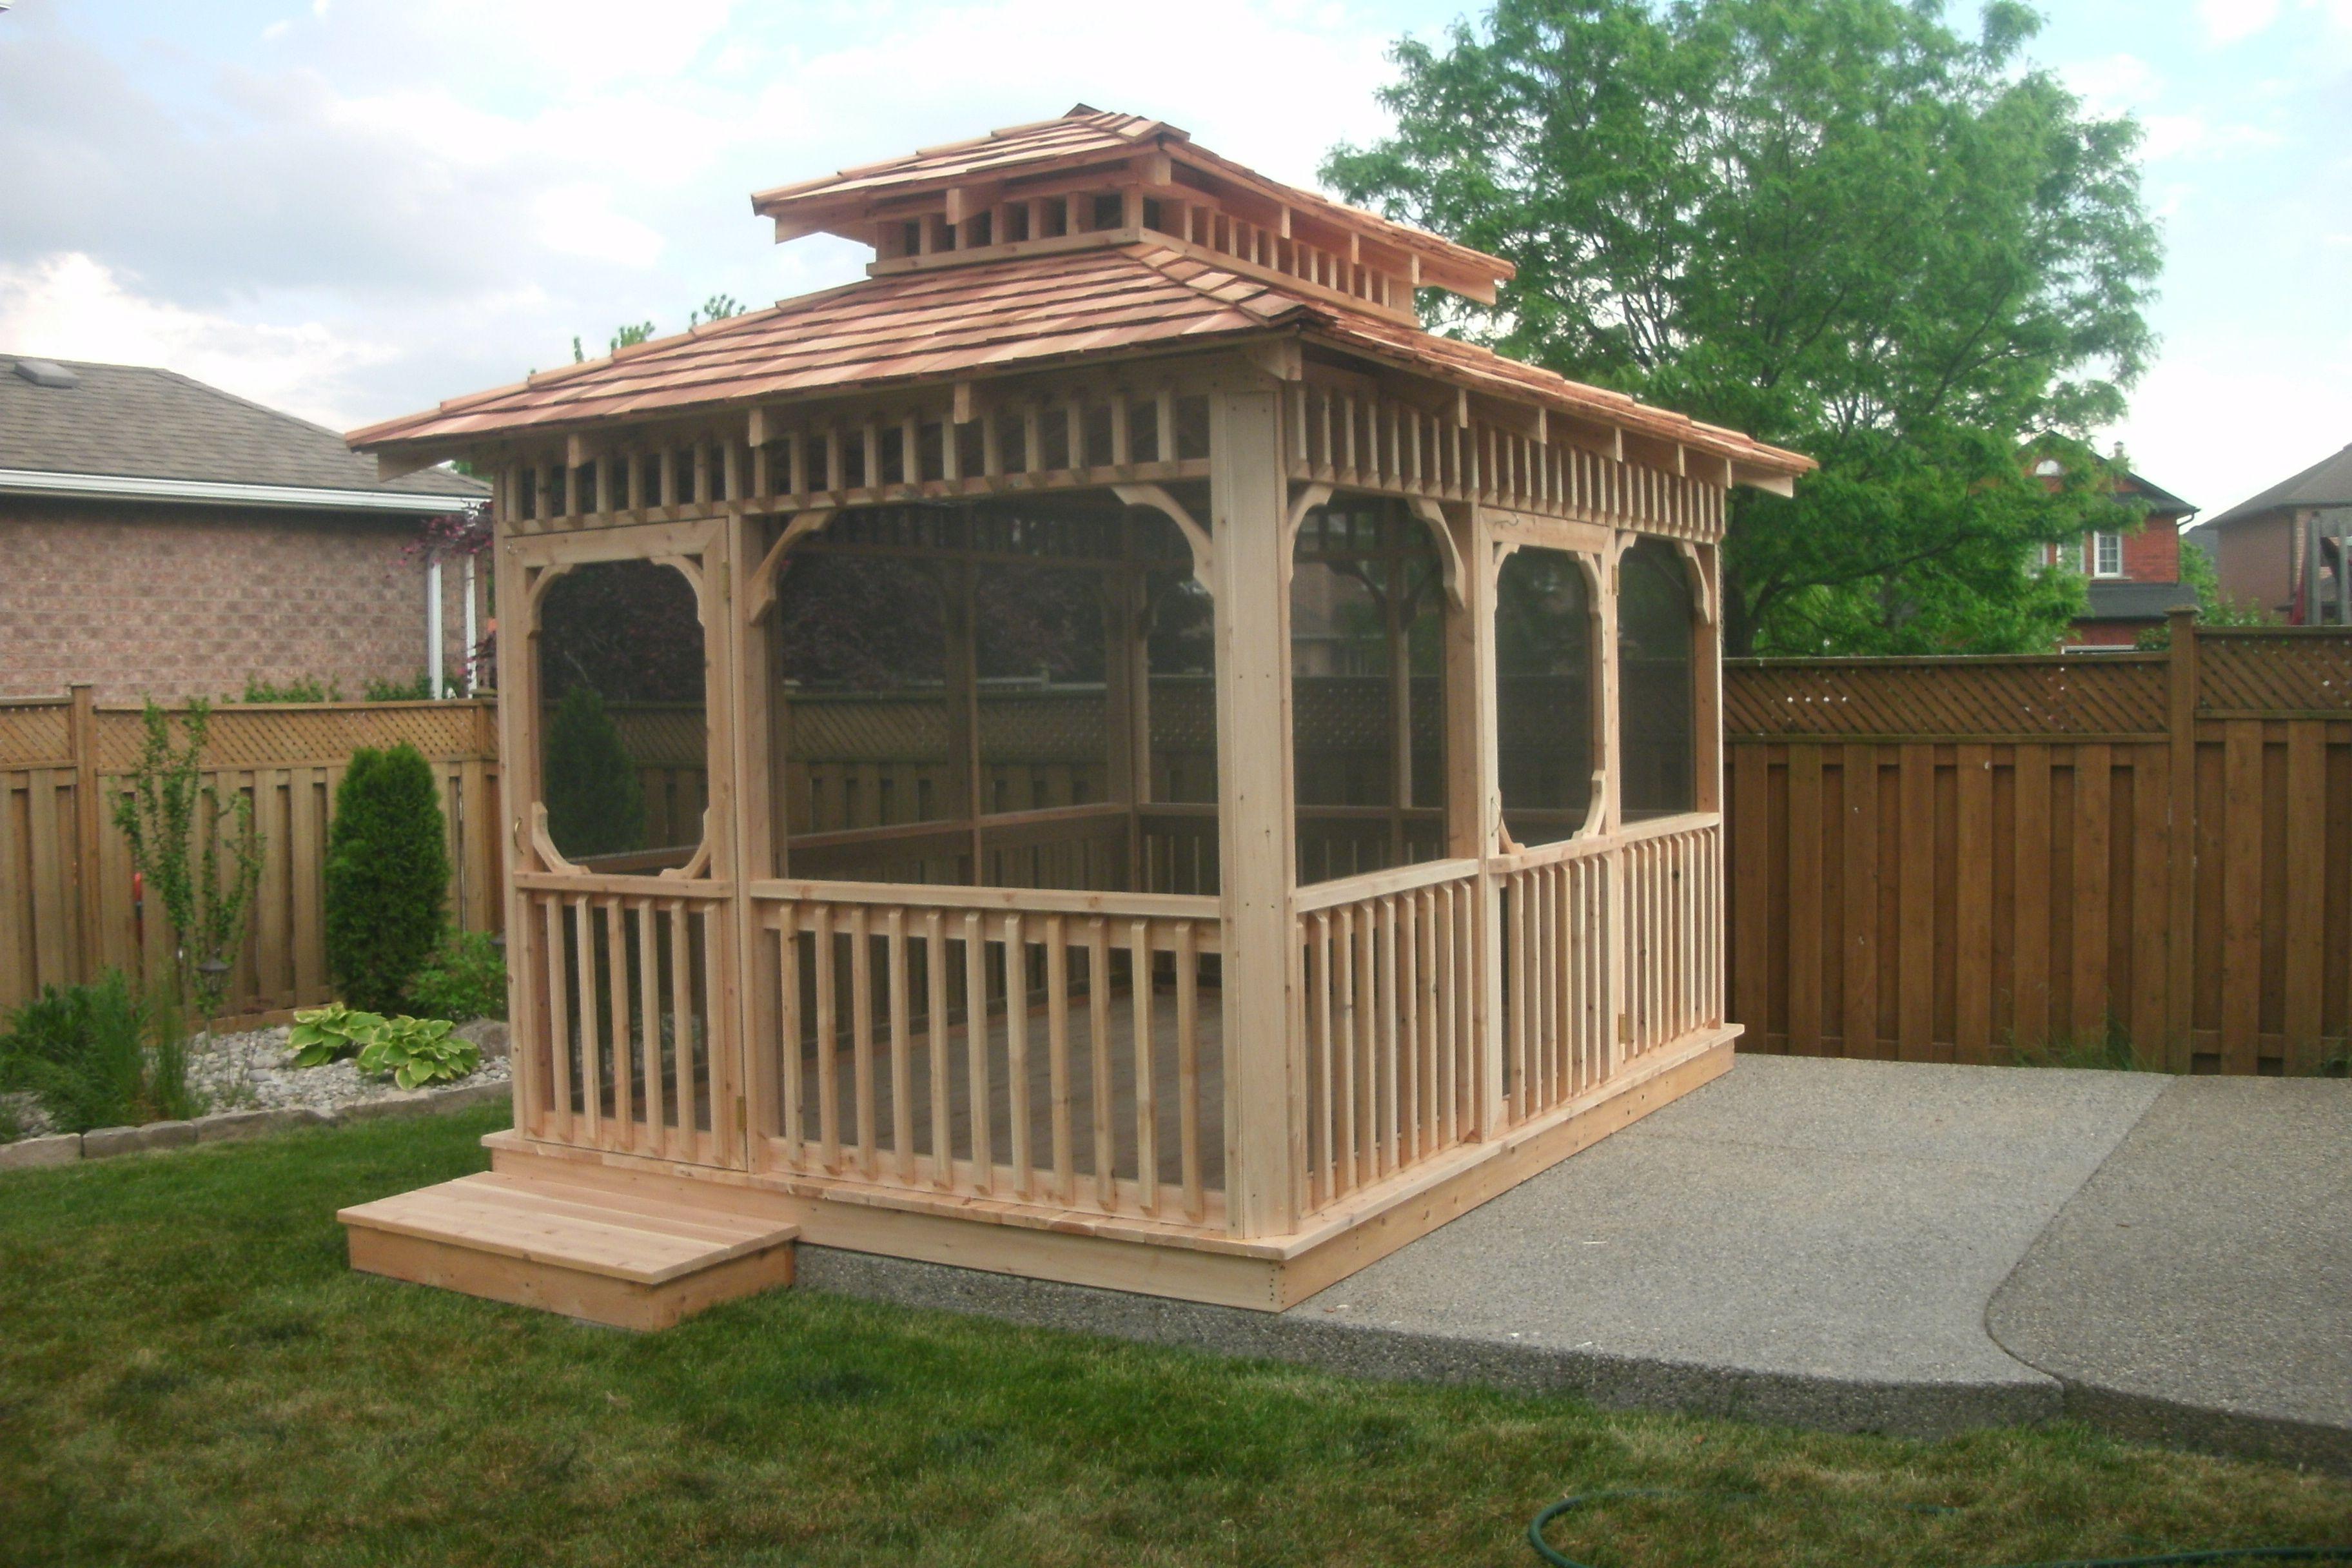 x beige single portable roof with canopy netting patio gazebo for gazeboabba at gazebos